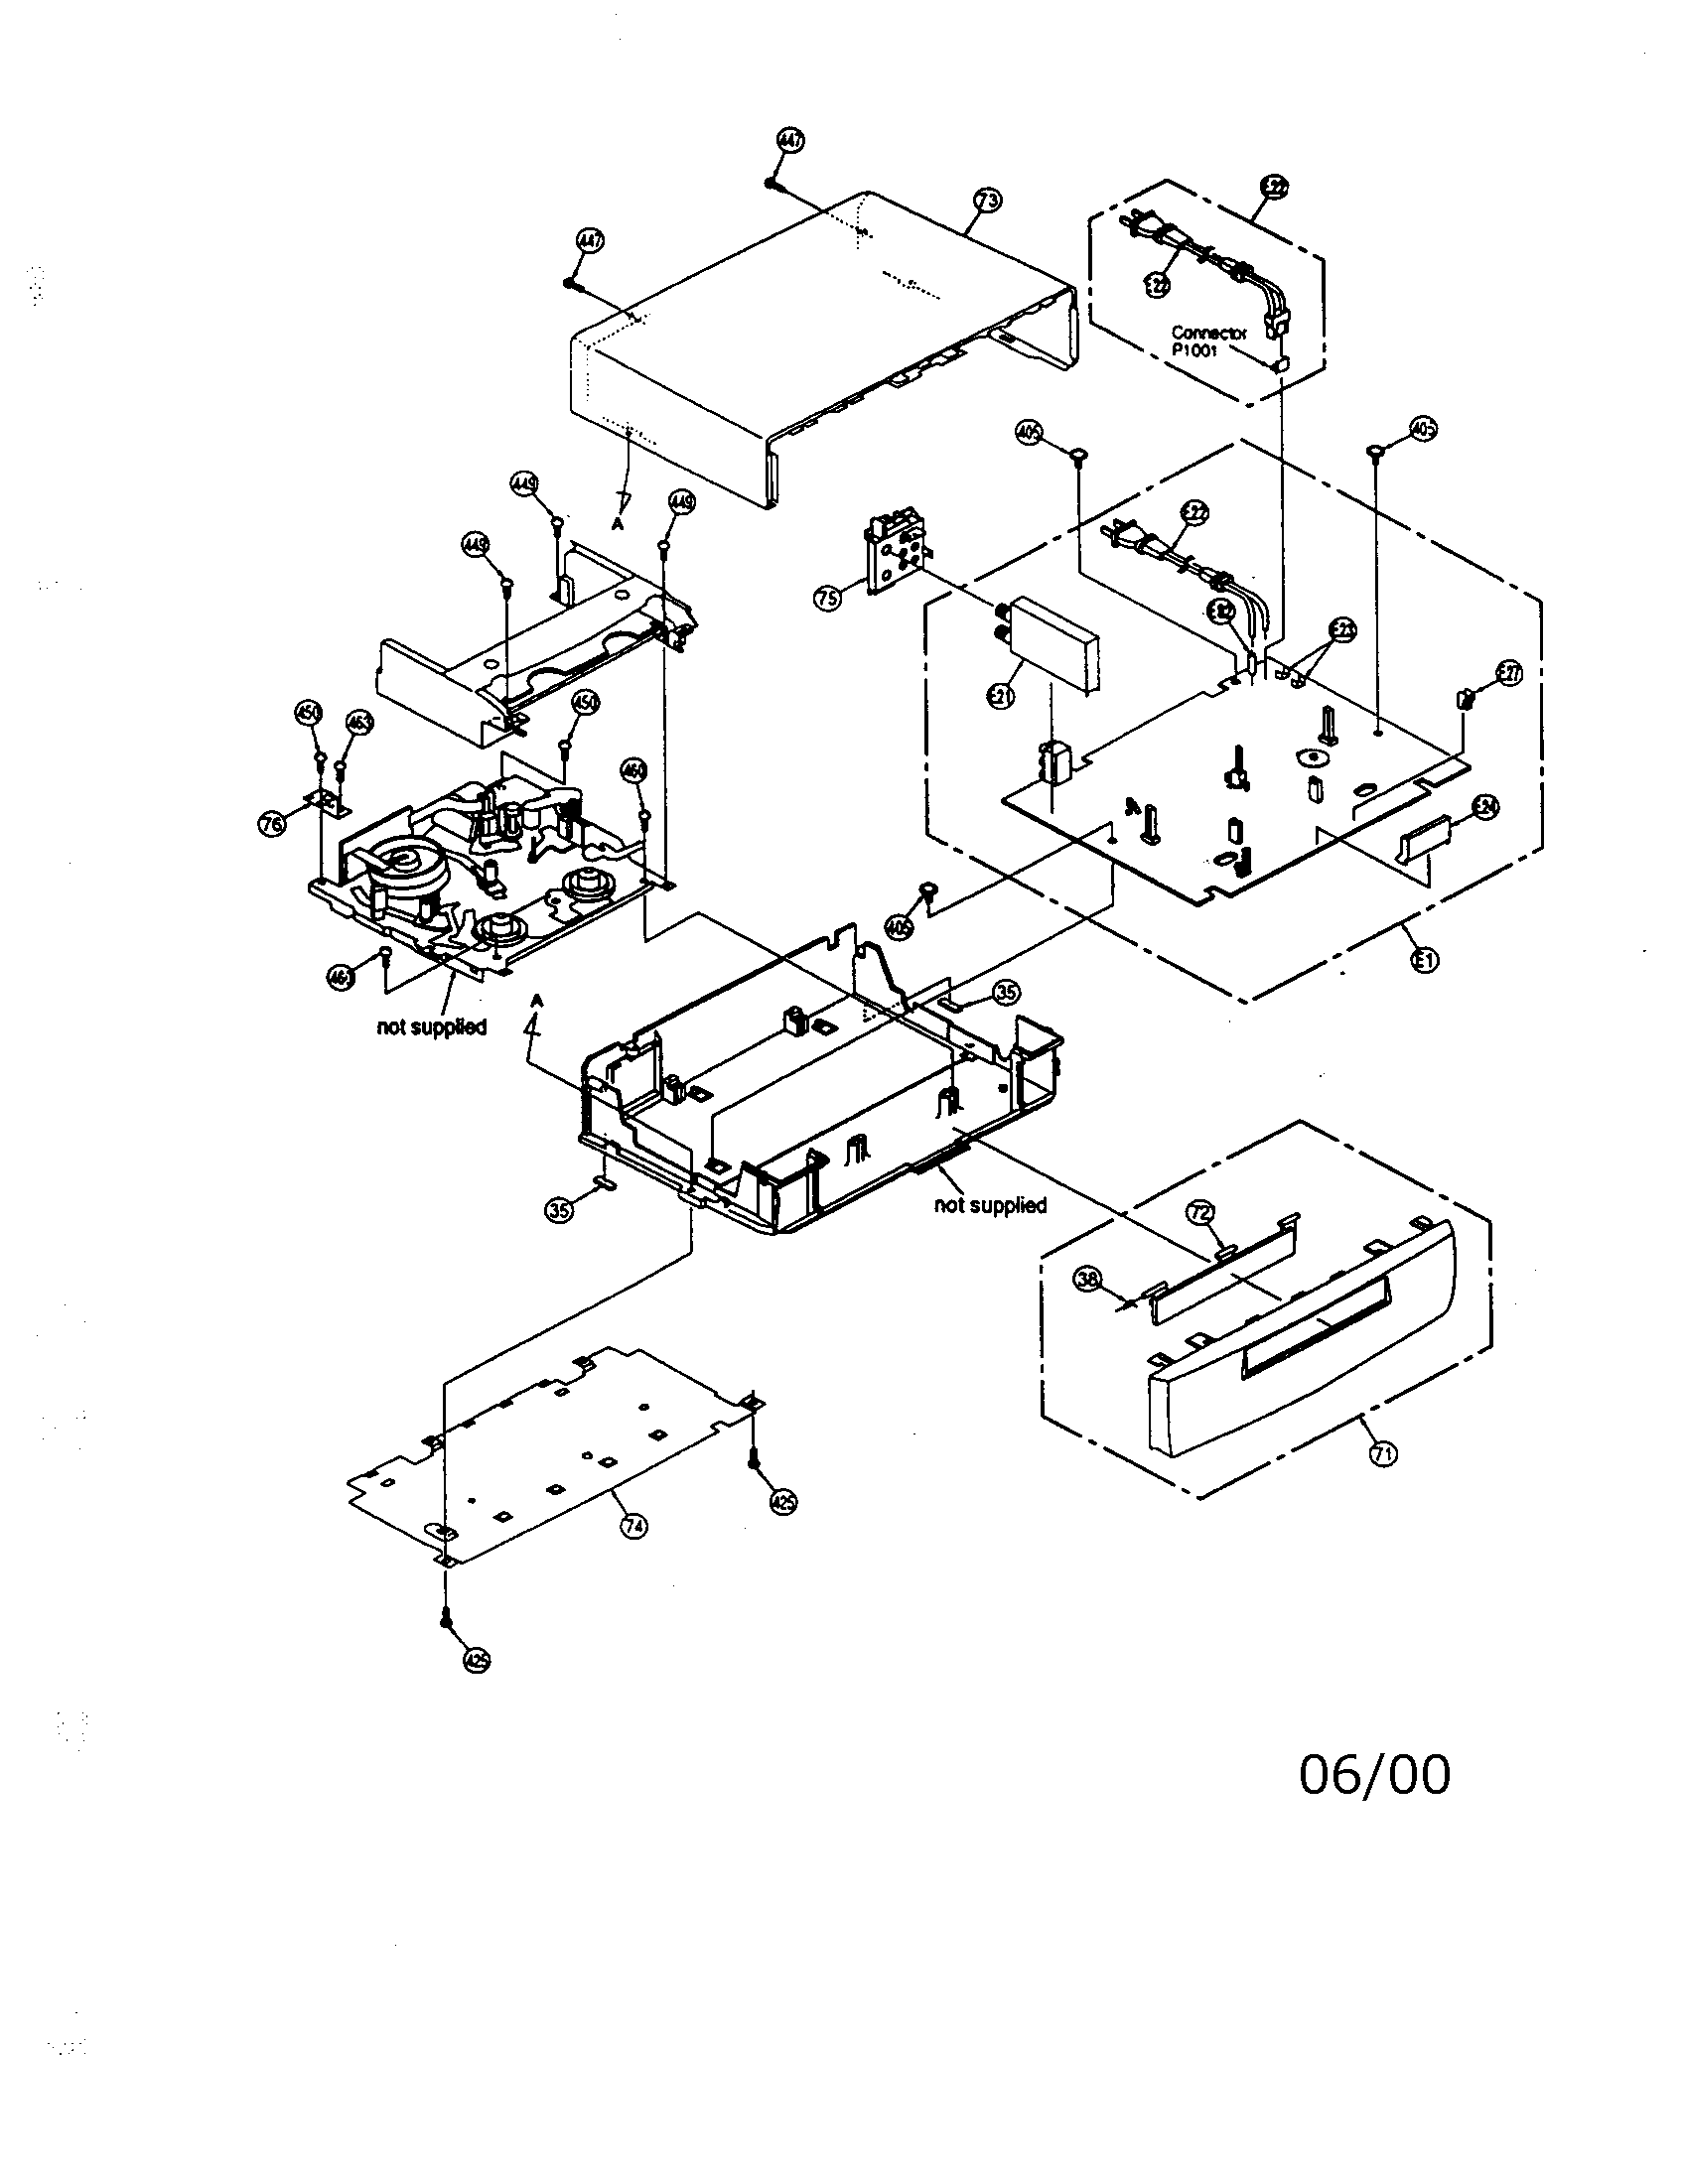 VCR Diagram & Parts List for Model pv-v4520-k Panasonic